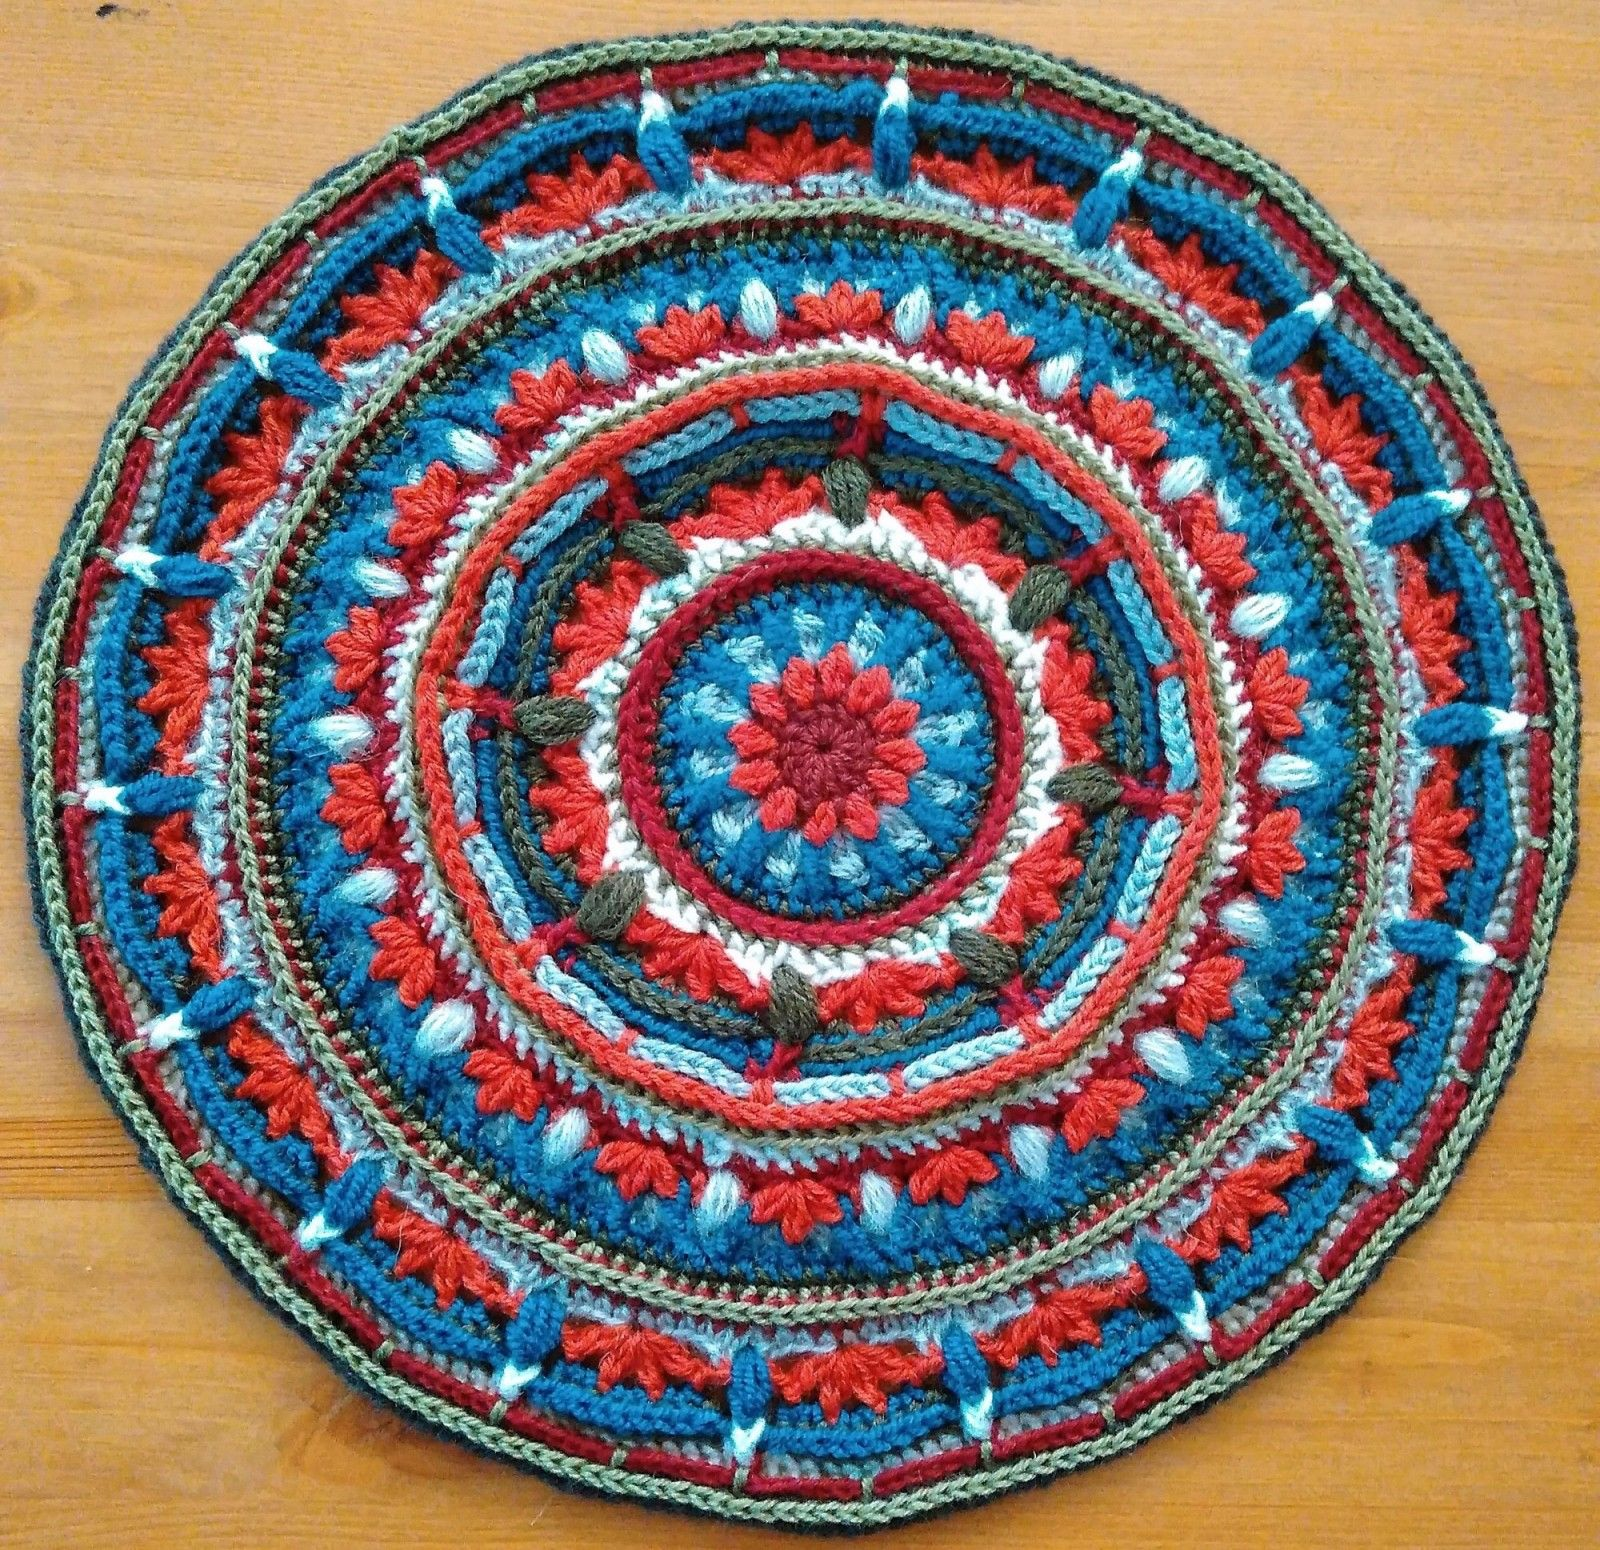 lilliana crochet cal tibetan | CrochetHolic - HilariaFina | Pinterest